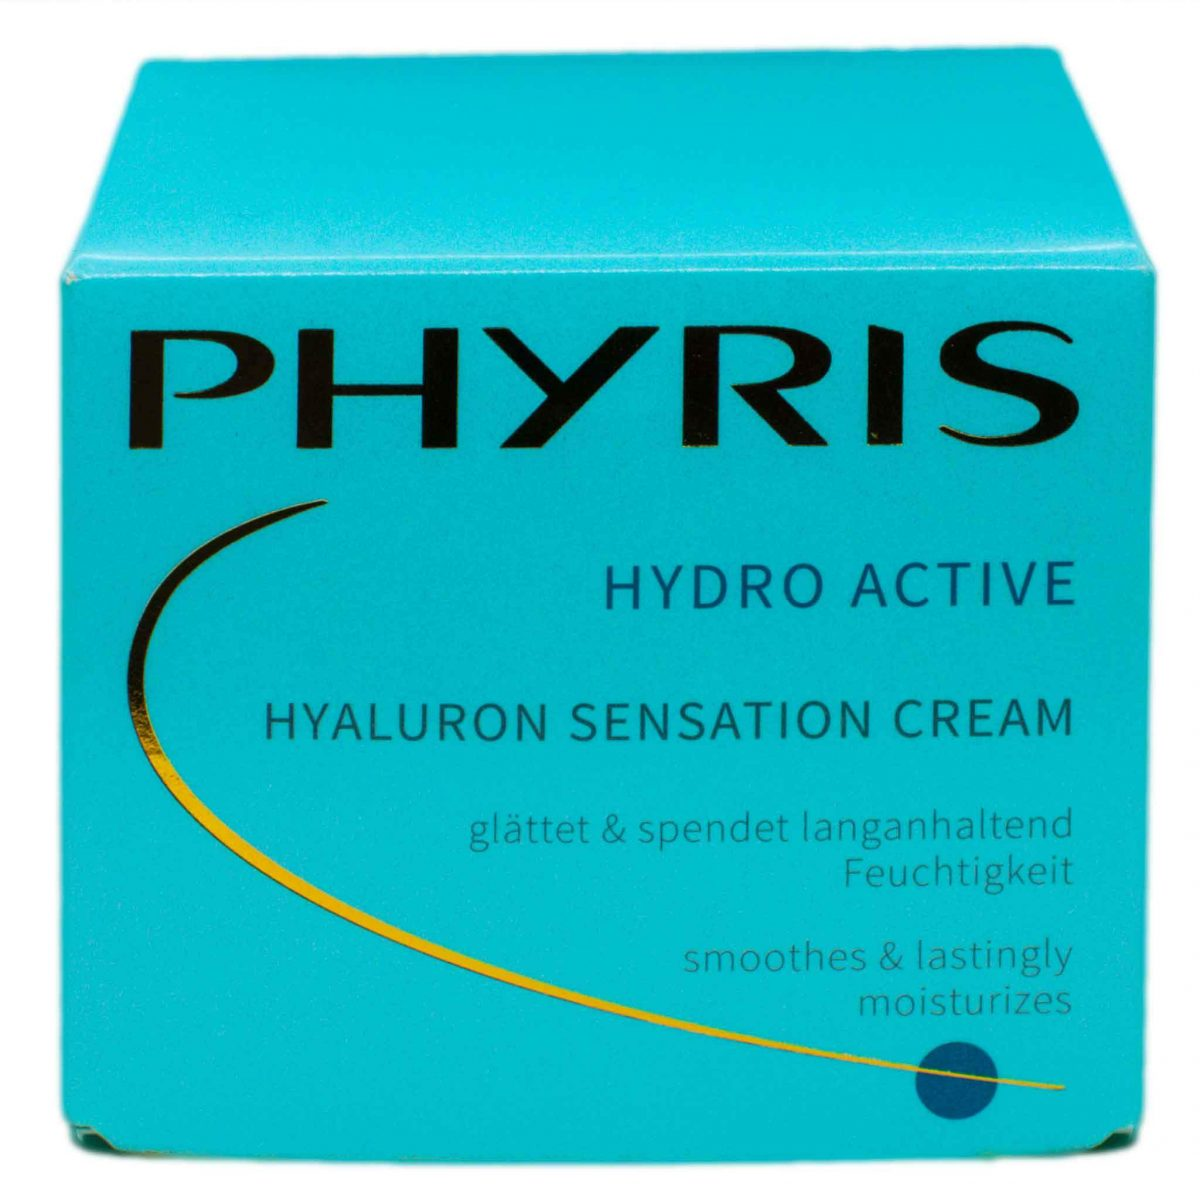 PHYRIS - Hyaluron Sensation Cream